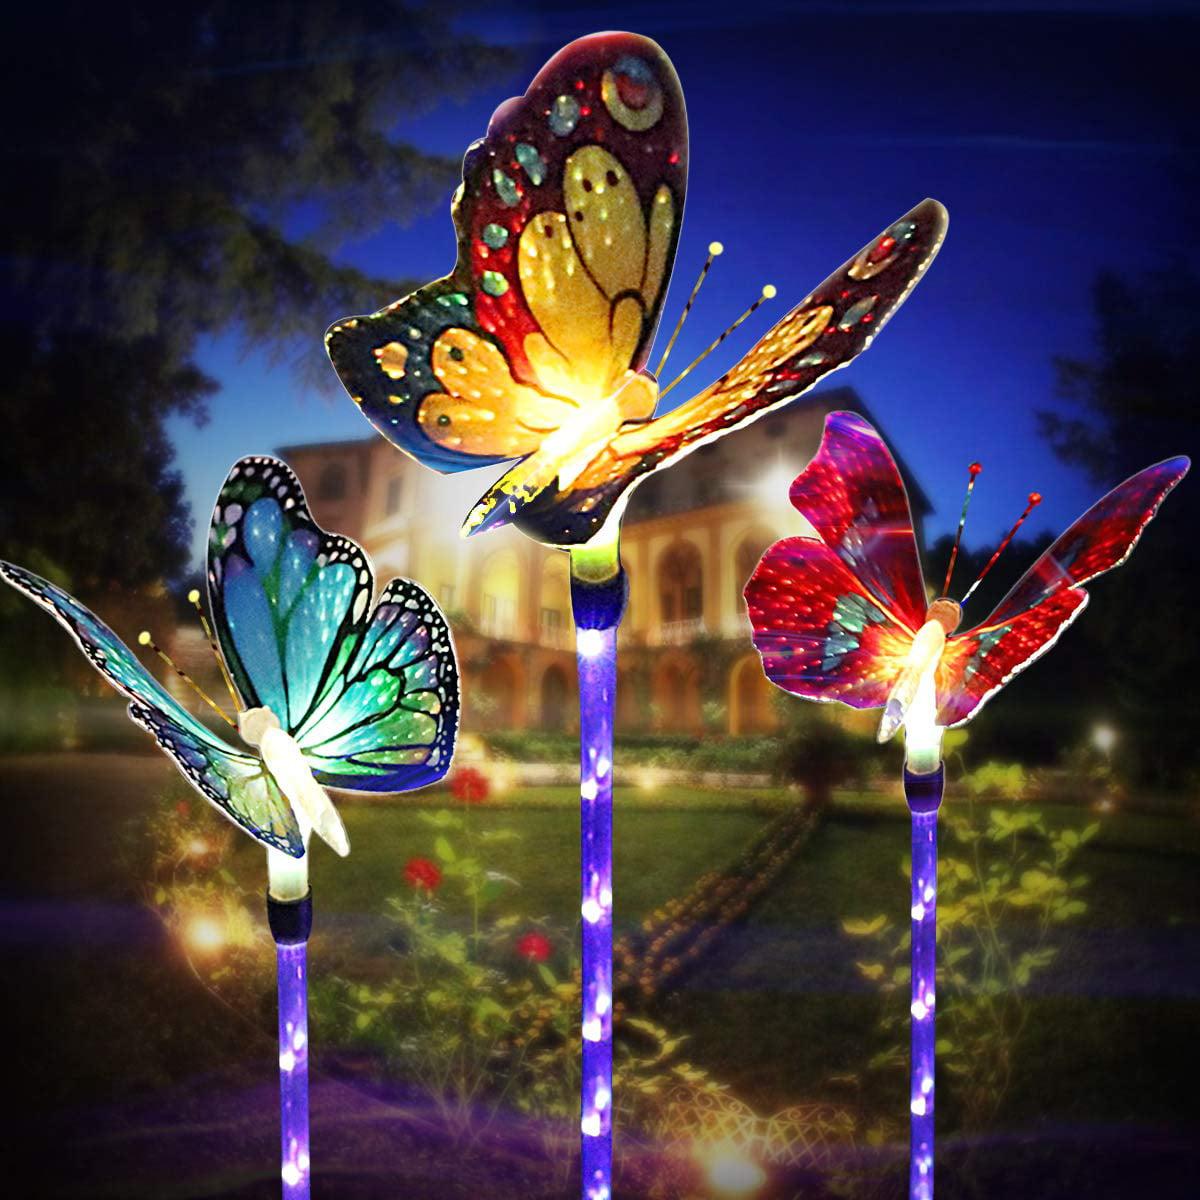 Garden Solar Lights Outdoor Multi Color Changing Solar Powered Led Garden Lights Fiber Optic Butterfly Decorative Lights Outdoor Decor Yard Art Garden Decorations 3 Pack Walmart Com Walmart Com